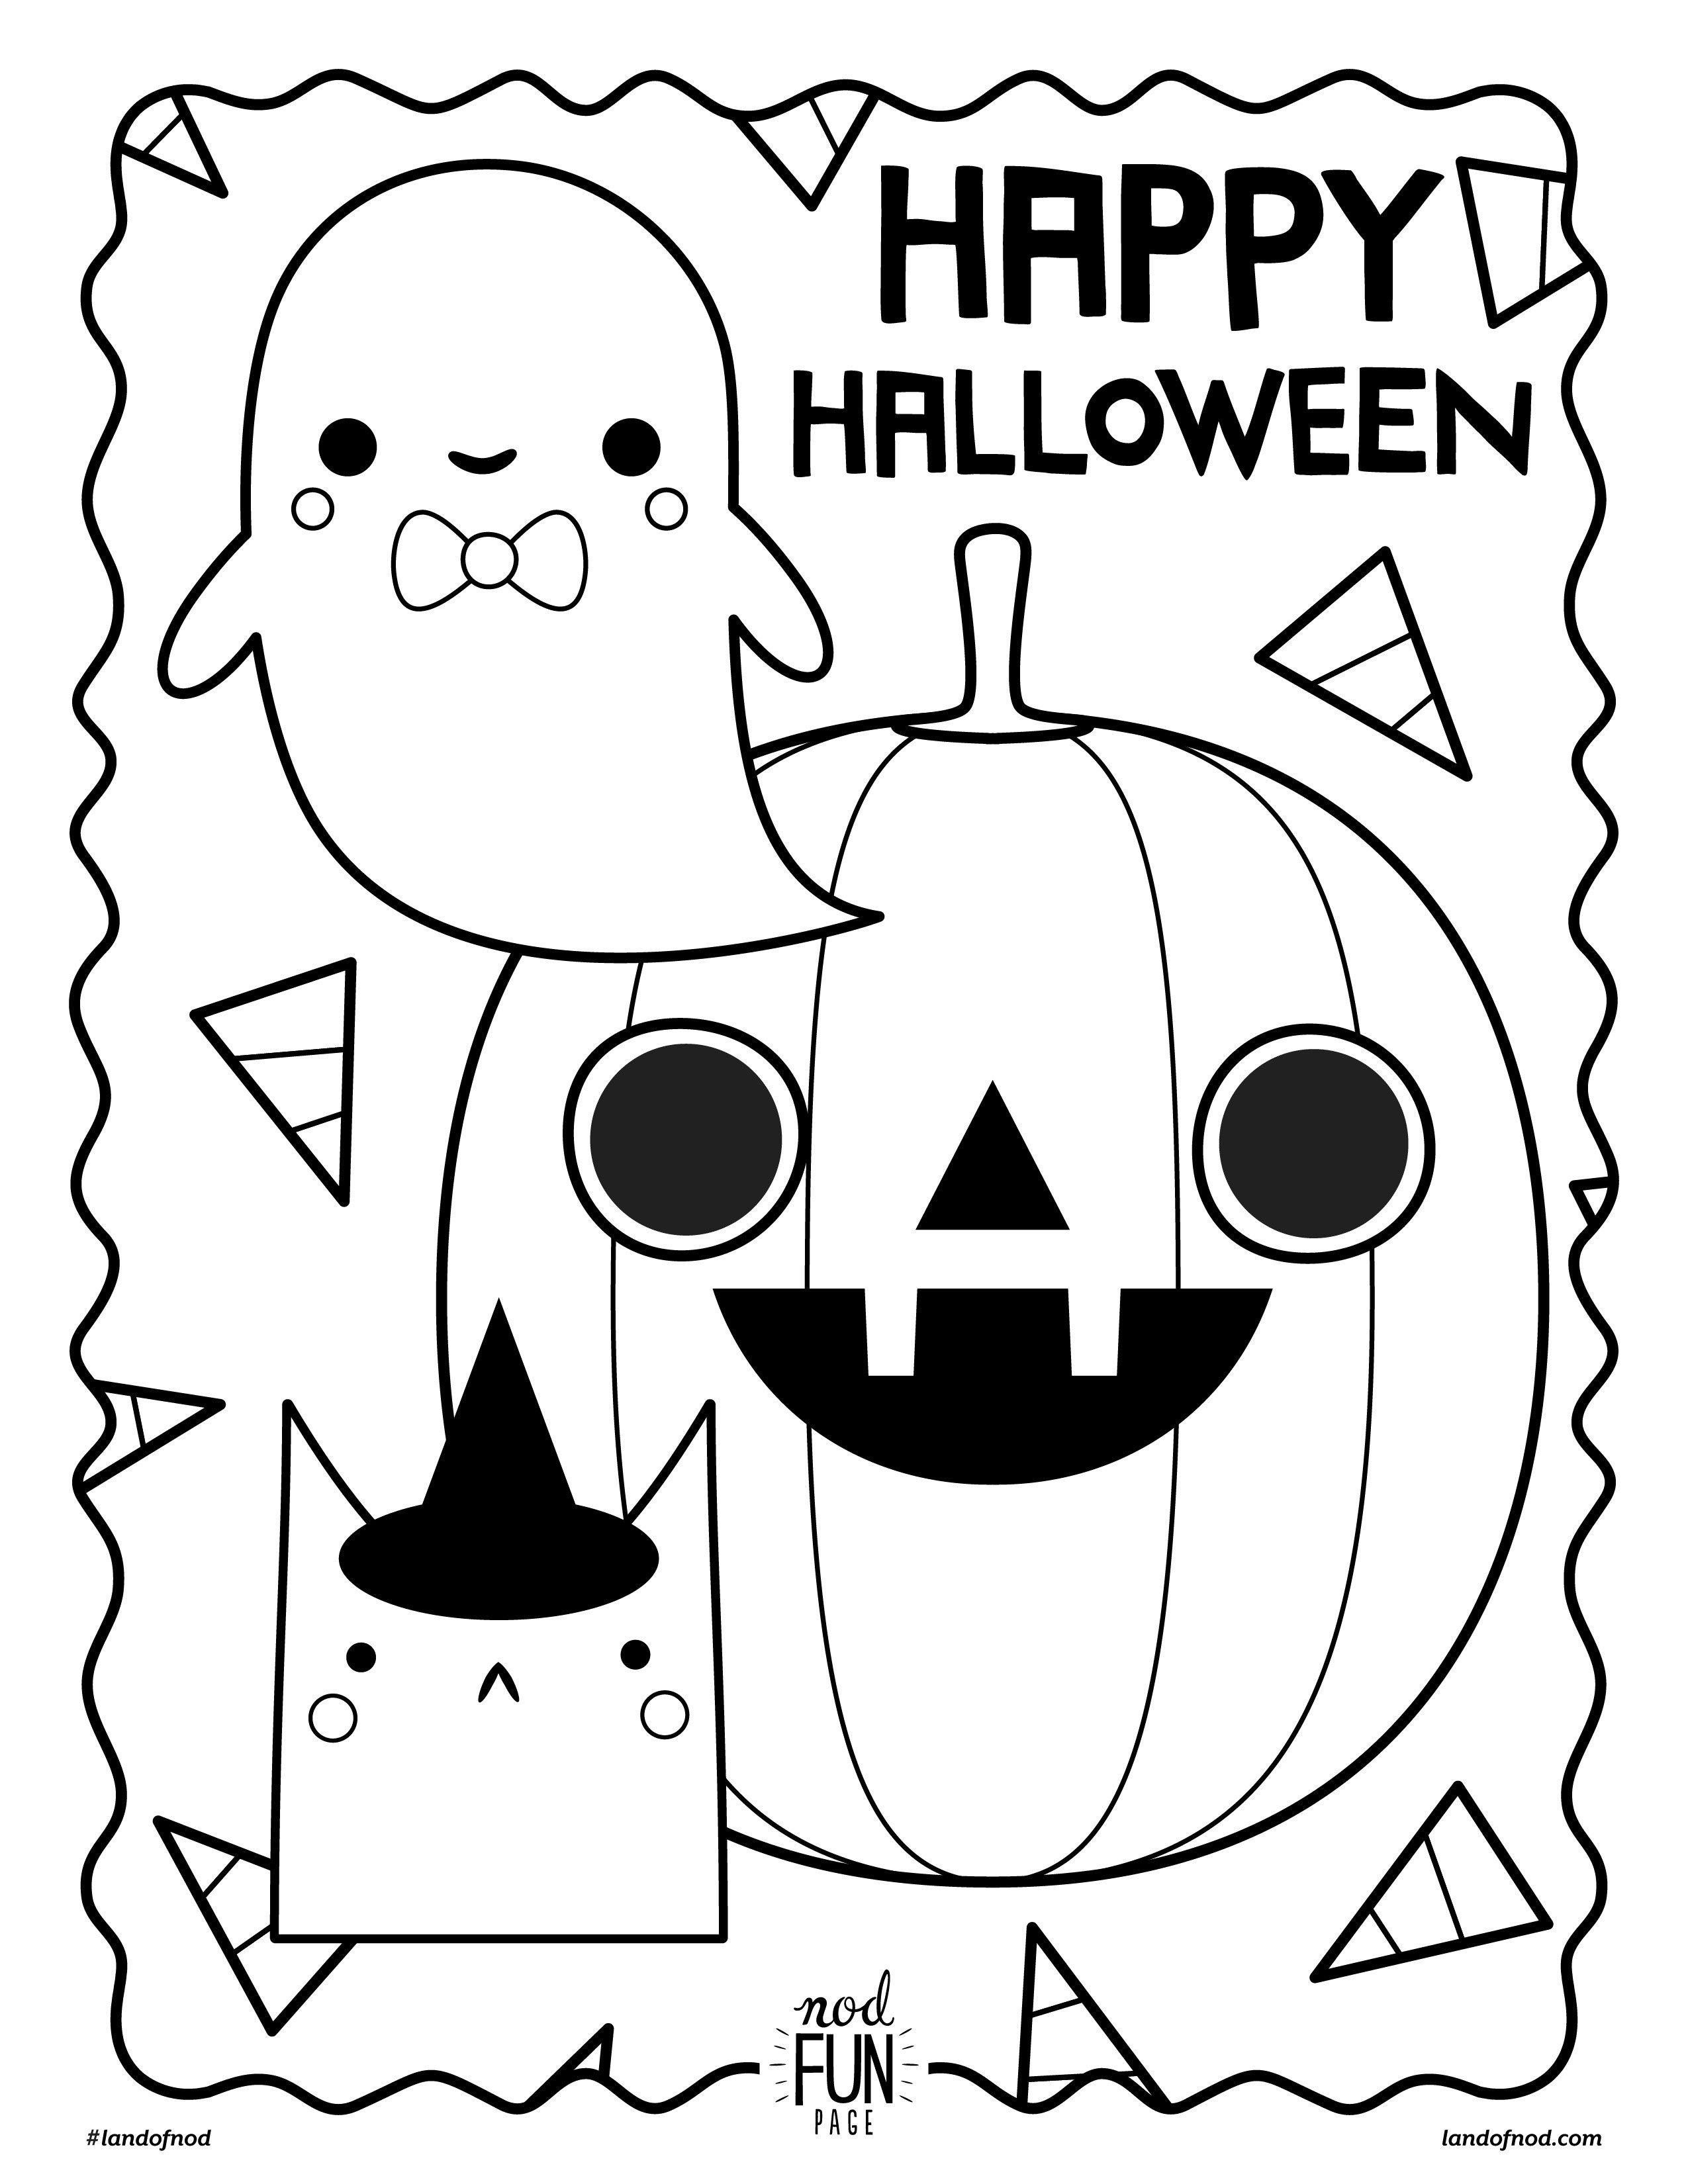 Free Printable Halloween Coloring Page   Preschool Halloween - Free Printable Halloween Coloring Pages